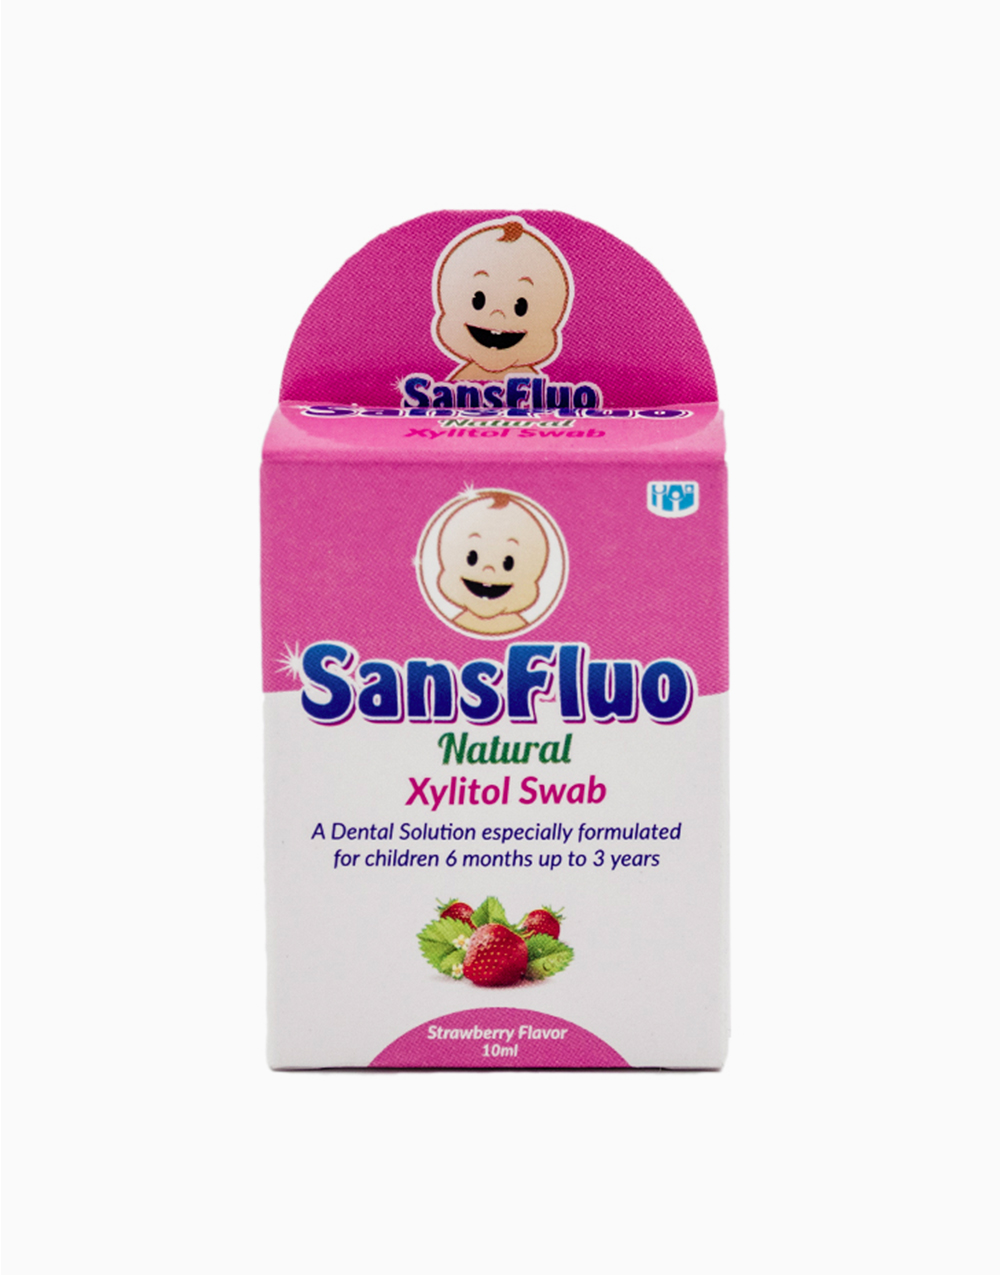 SansFluo Natural Xylitol Swab (10ml) by Sansfluo